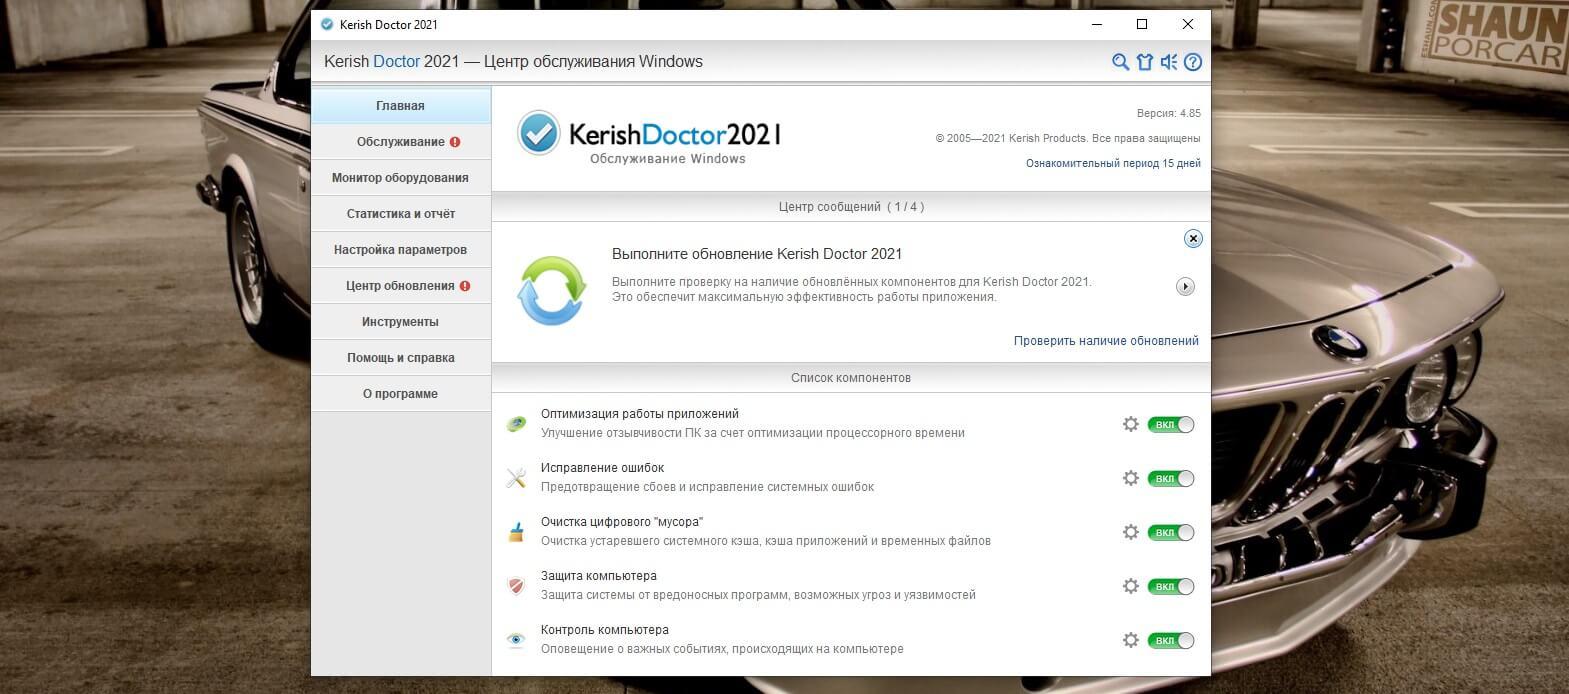 Kerish Doctor средство очистки компьютера